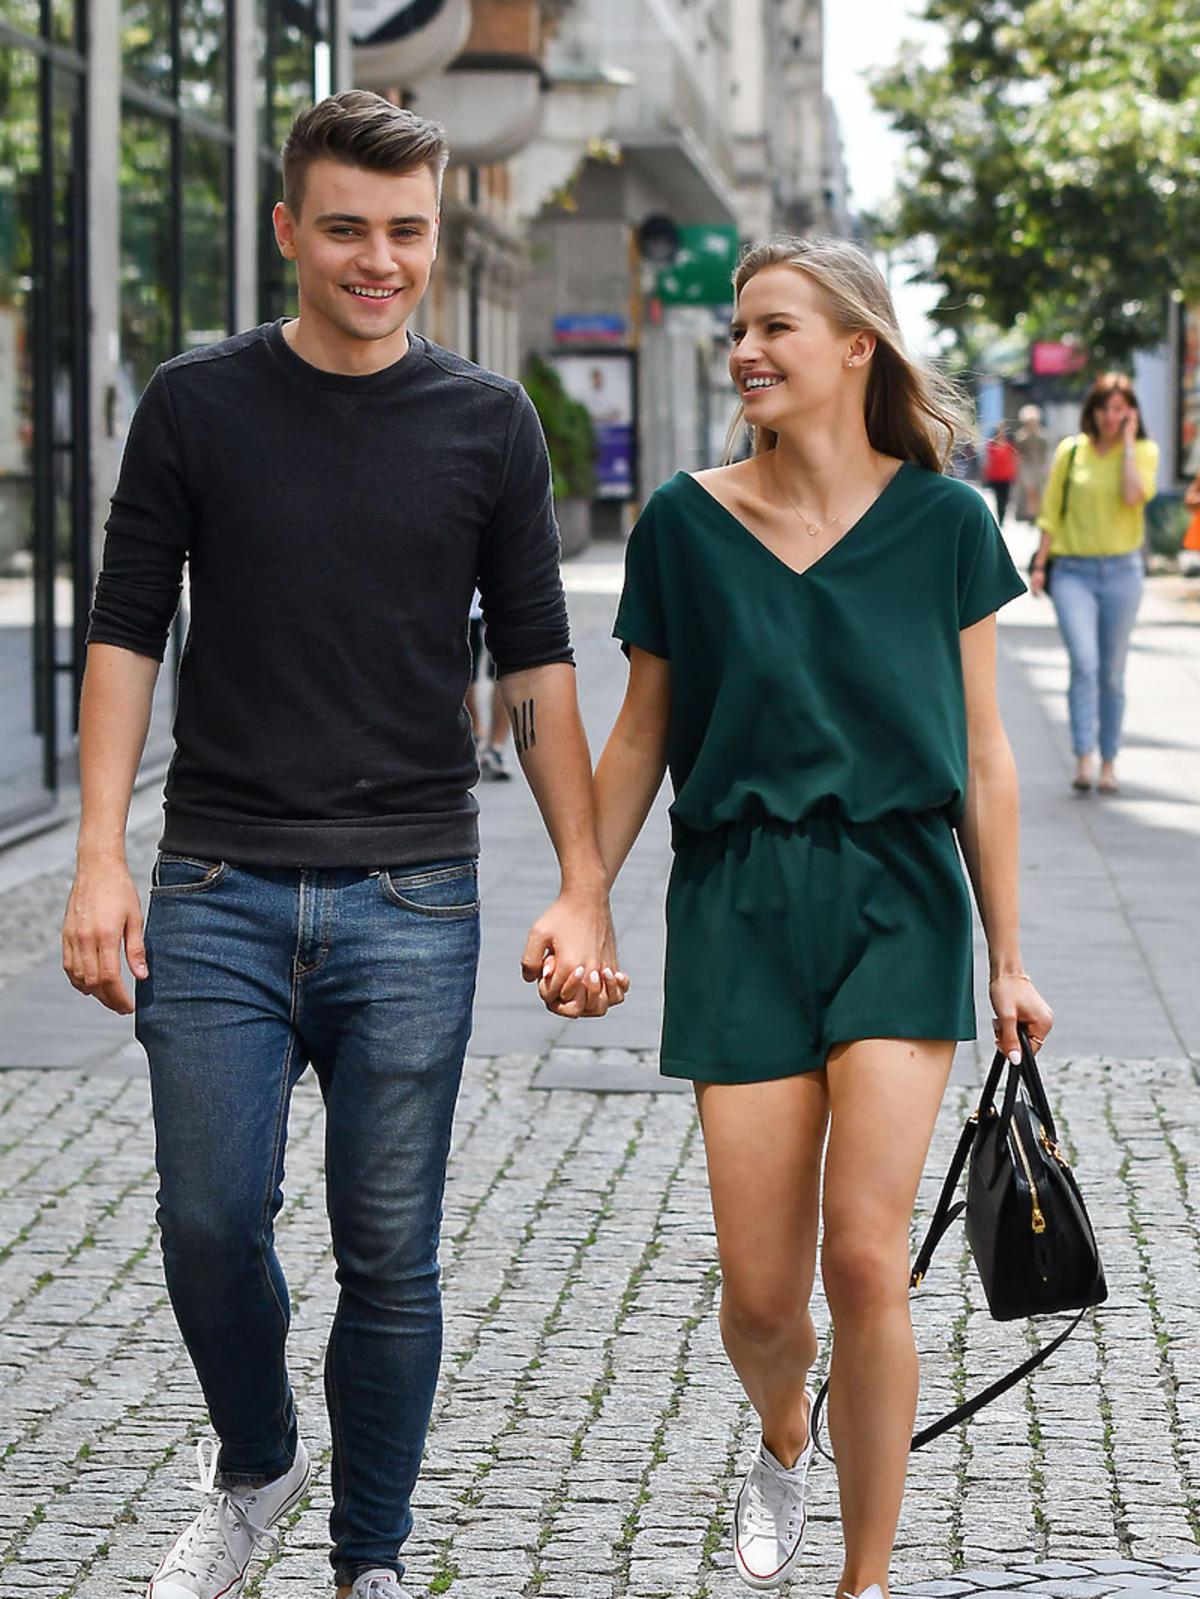 Damian Kordas i Karolina Pisarek na spacerze